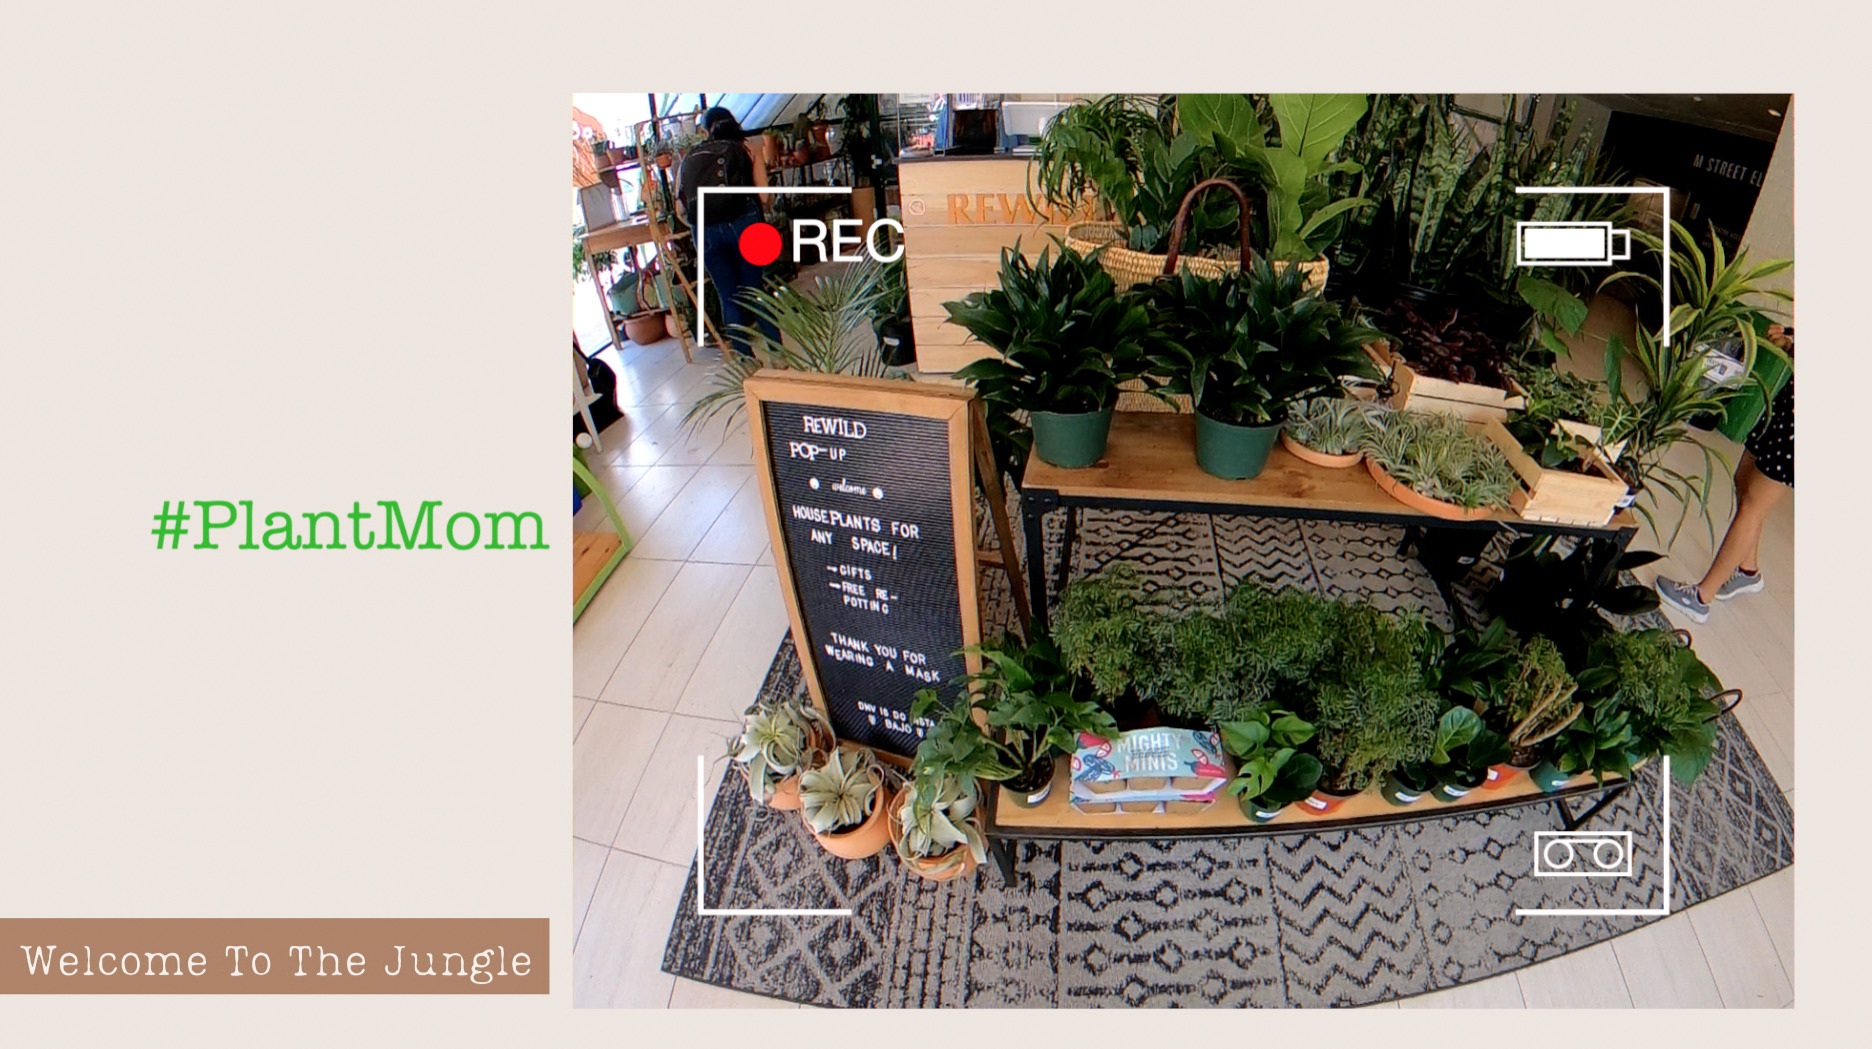 REWILD - Plant Nursery in Georgetown